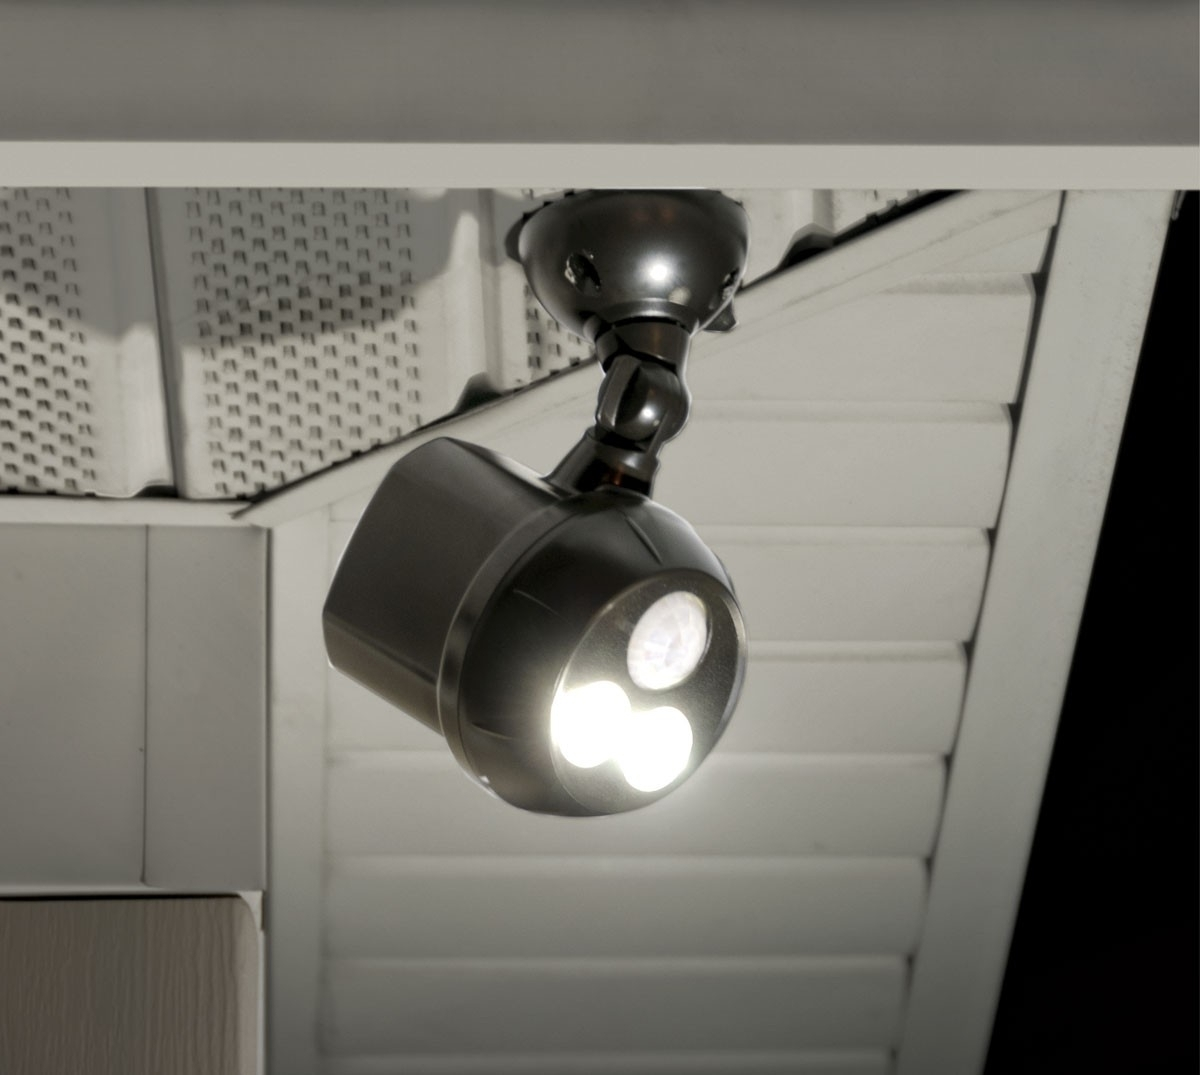 Outdoor Ceiling Mount Motion Sensor Light • Outdoor Lighting Intended For Outdoor Ceiling Security Lights (View 3 of 15)